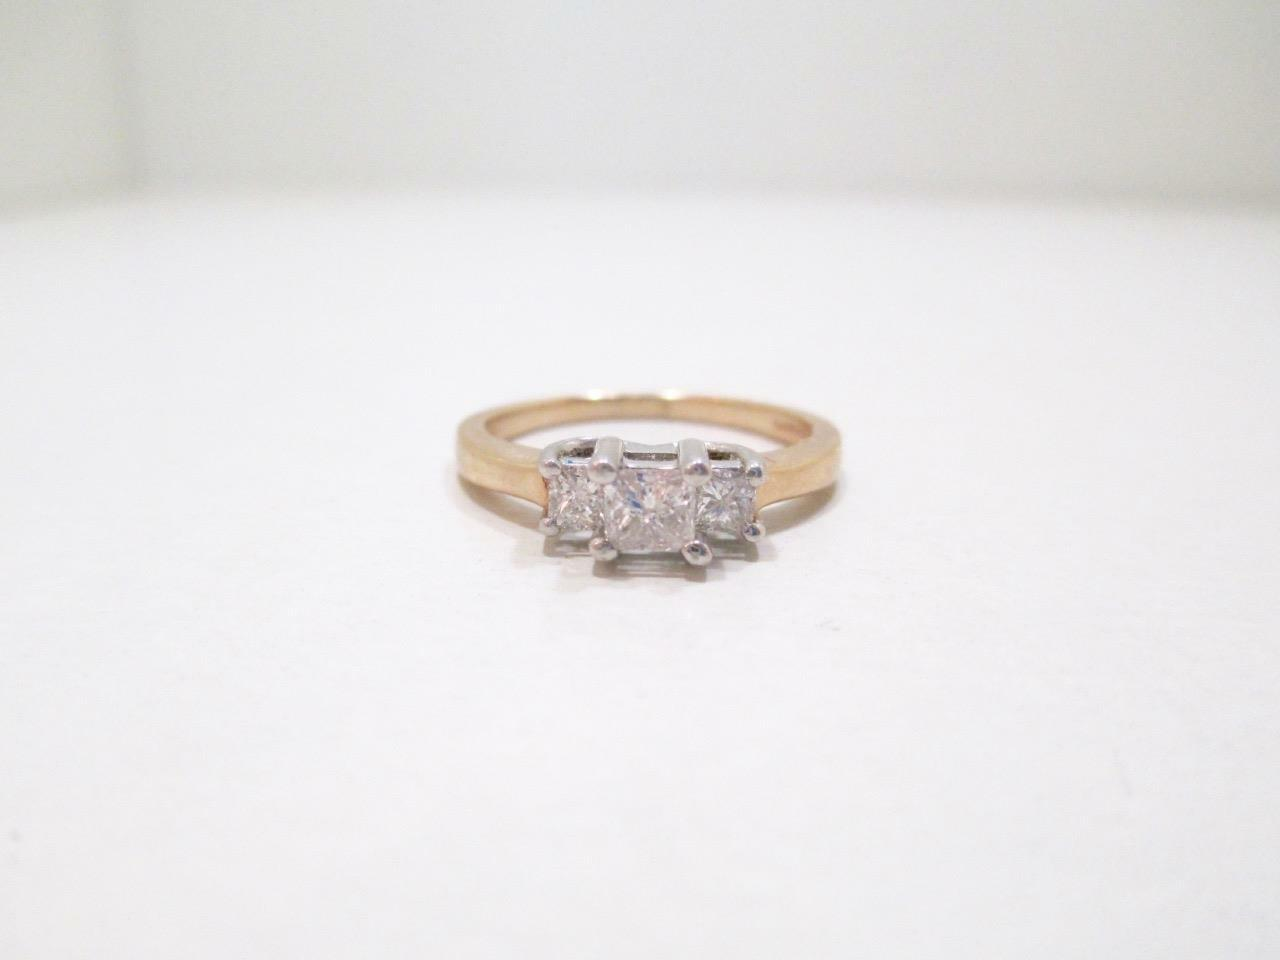 PLATINUM & 14 KT YELLOW gold PRINCESS CUT 1 2 CTW 3 STONE DIAMOND RING SIZE 7.25